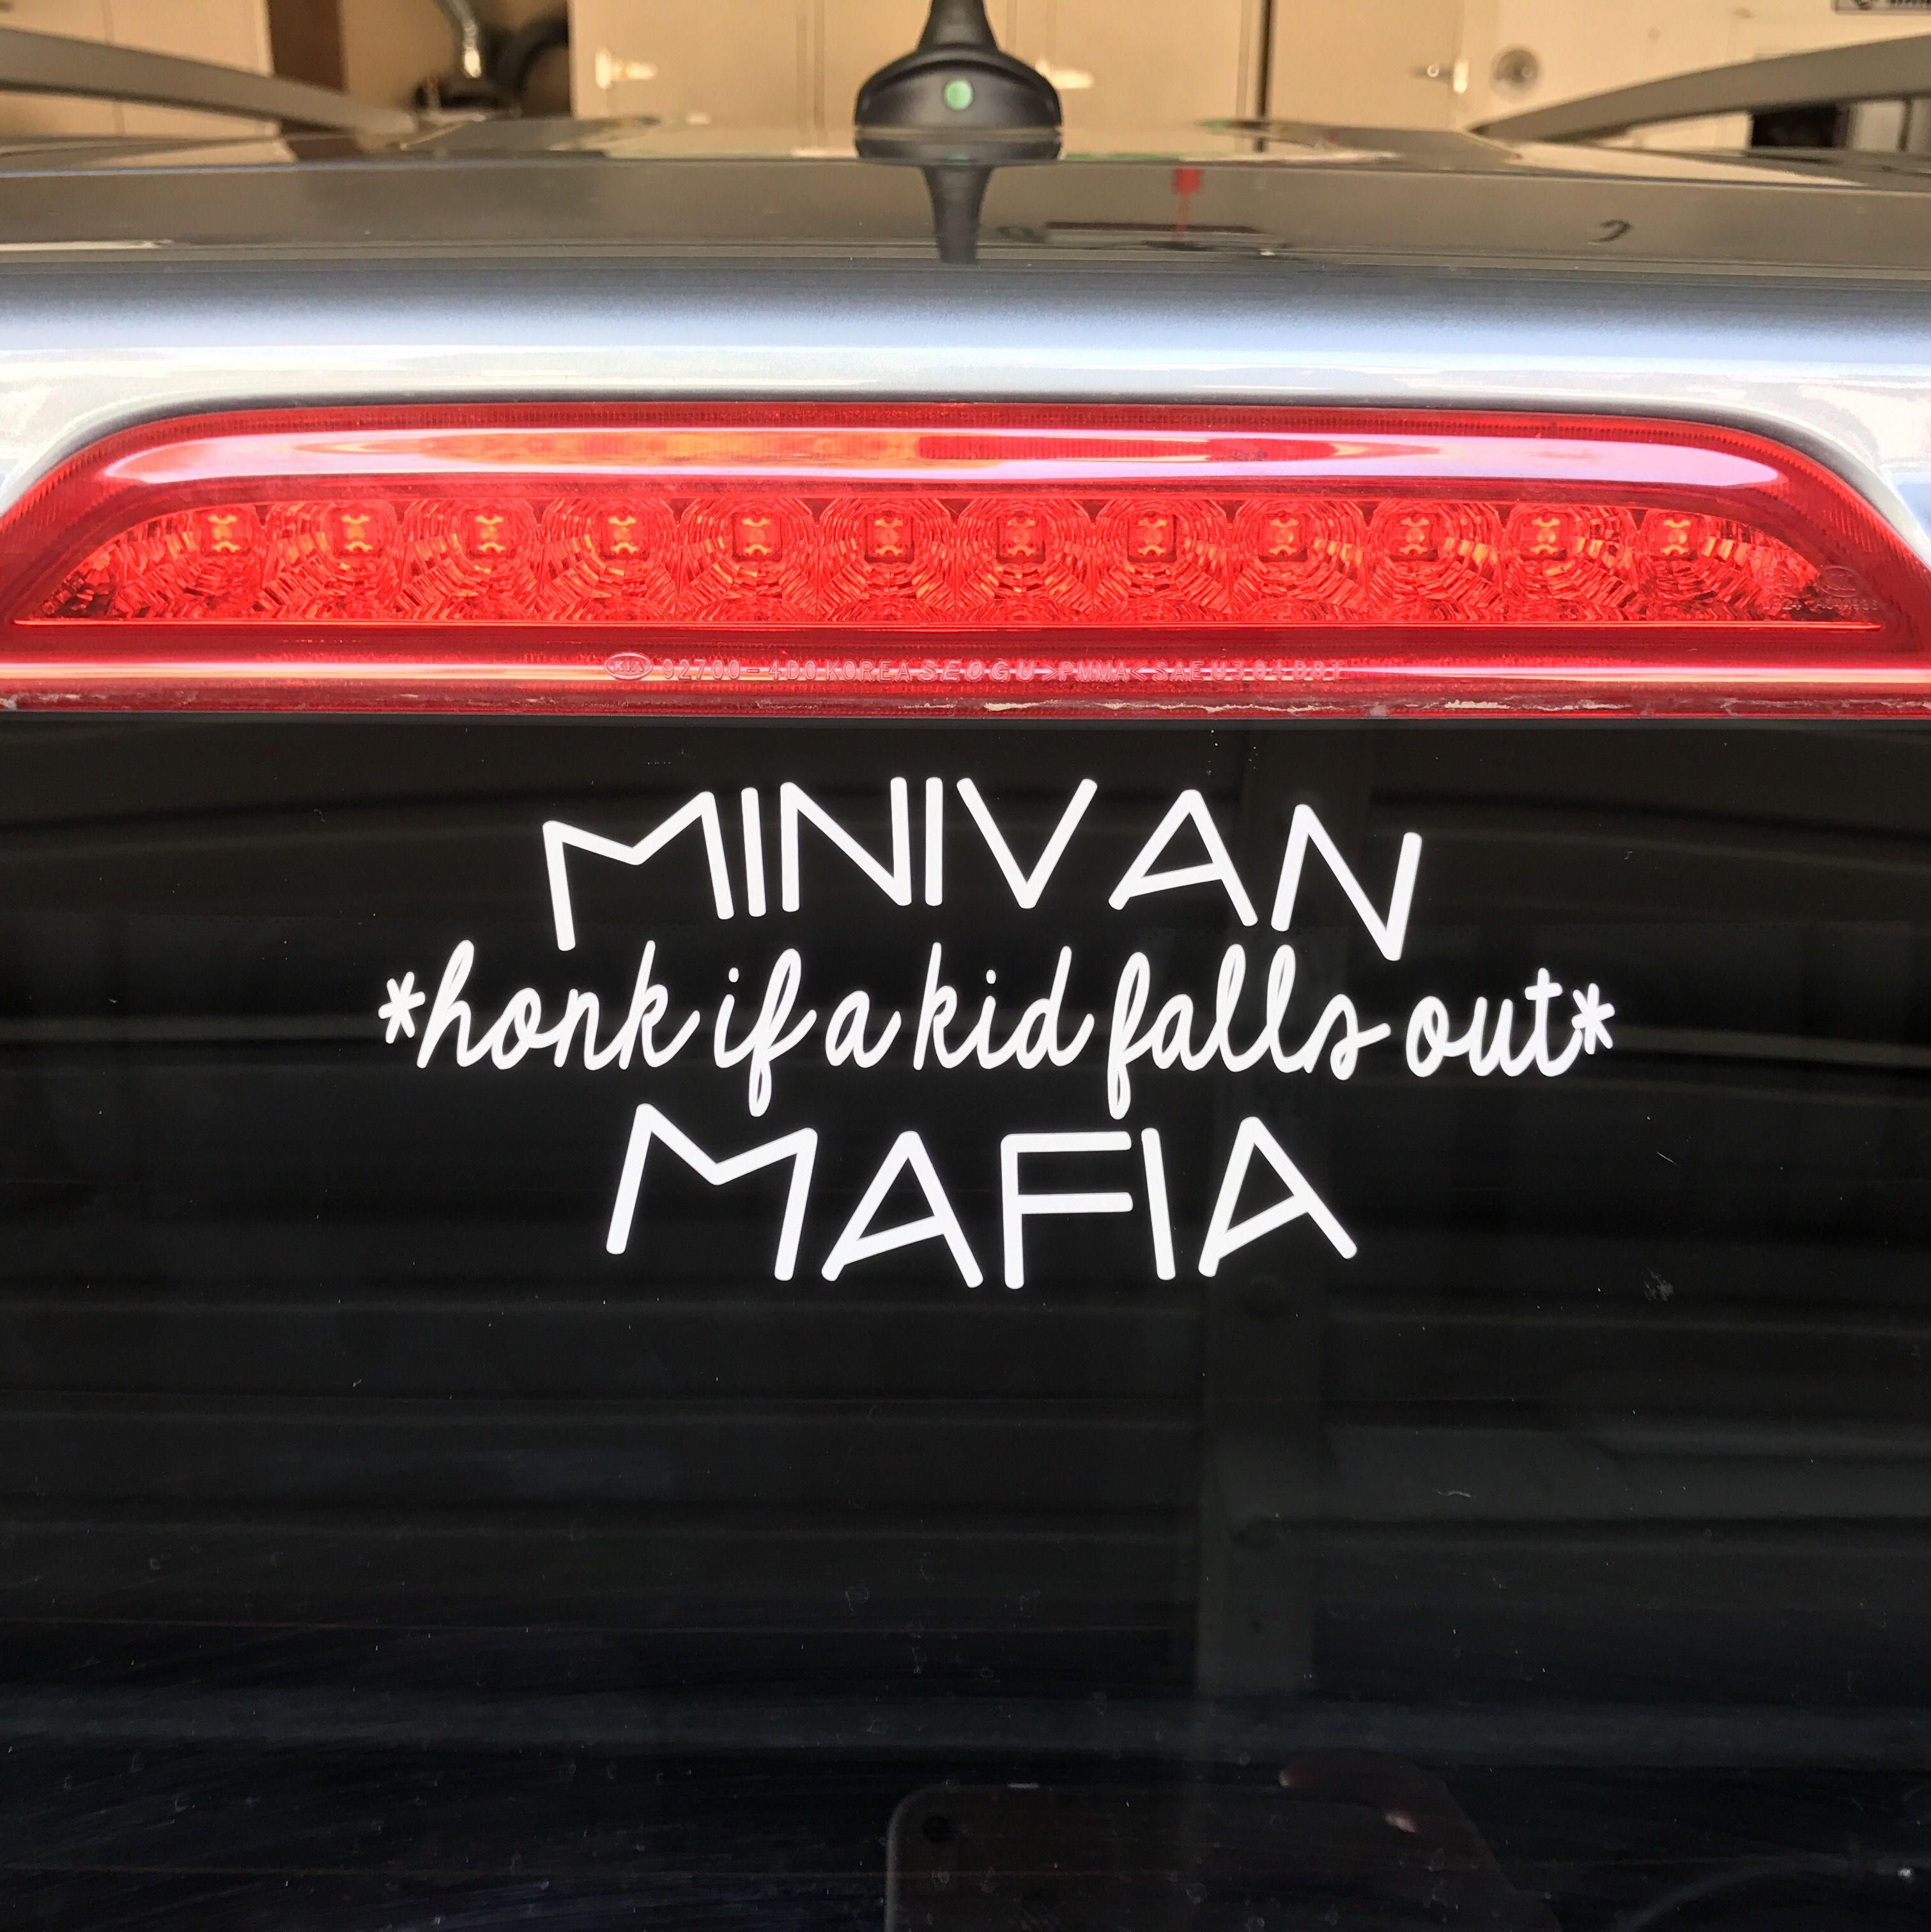 Minivan Mafia Honk If A Kid Falls Out Car Decal Minivans - How to make car decals with cricut explore